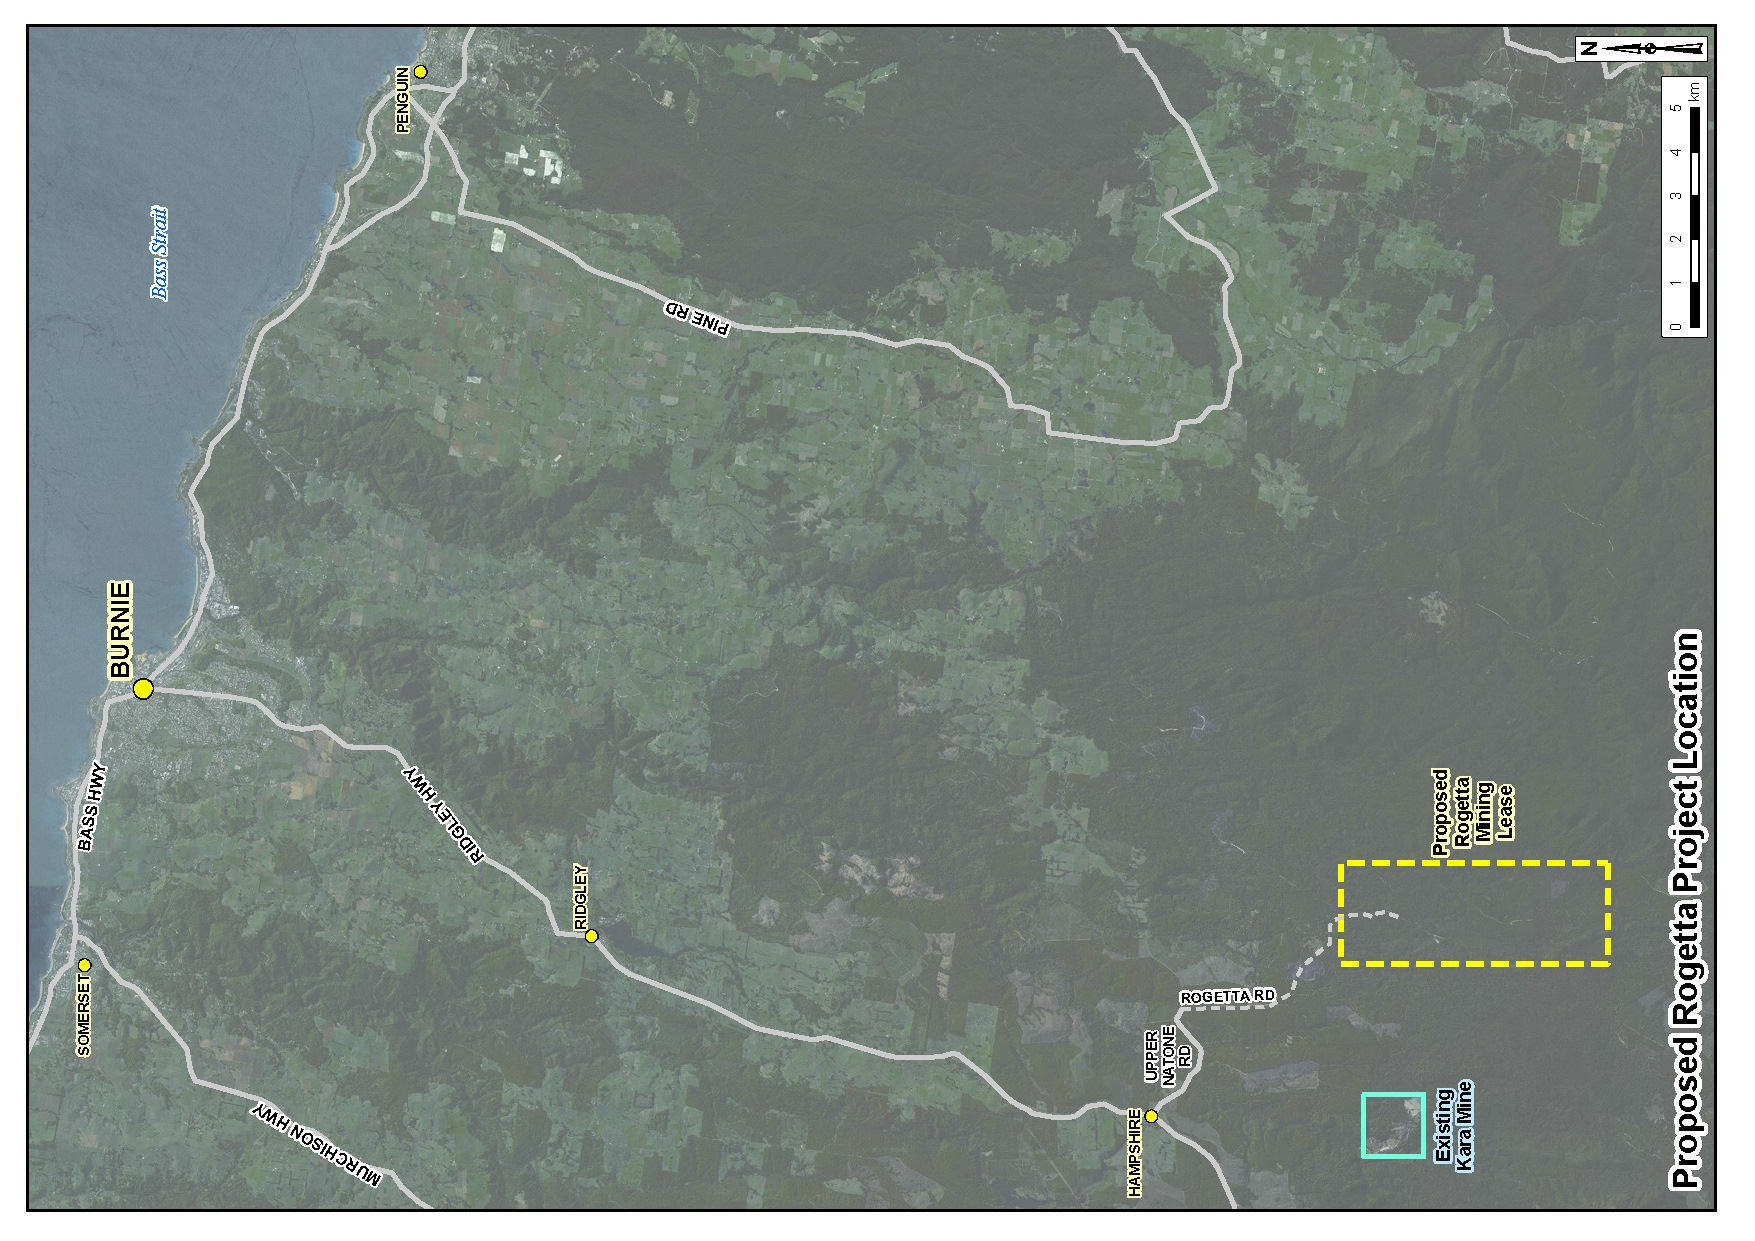 Tasmanian Government greenlights Rogetta Mine lease